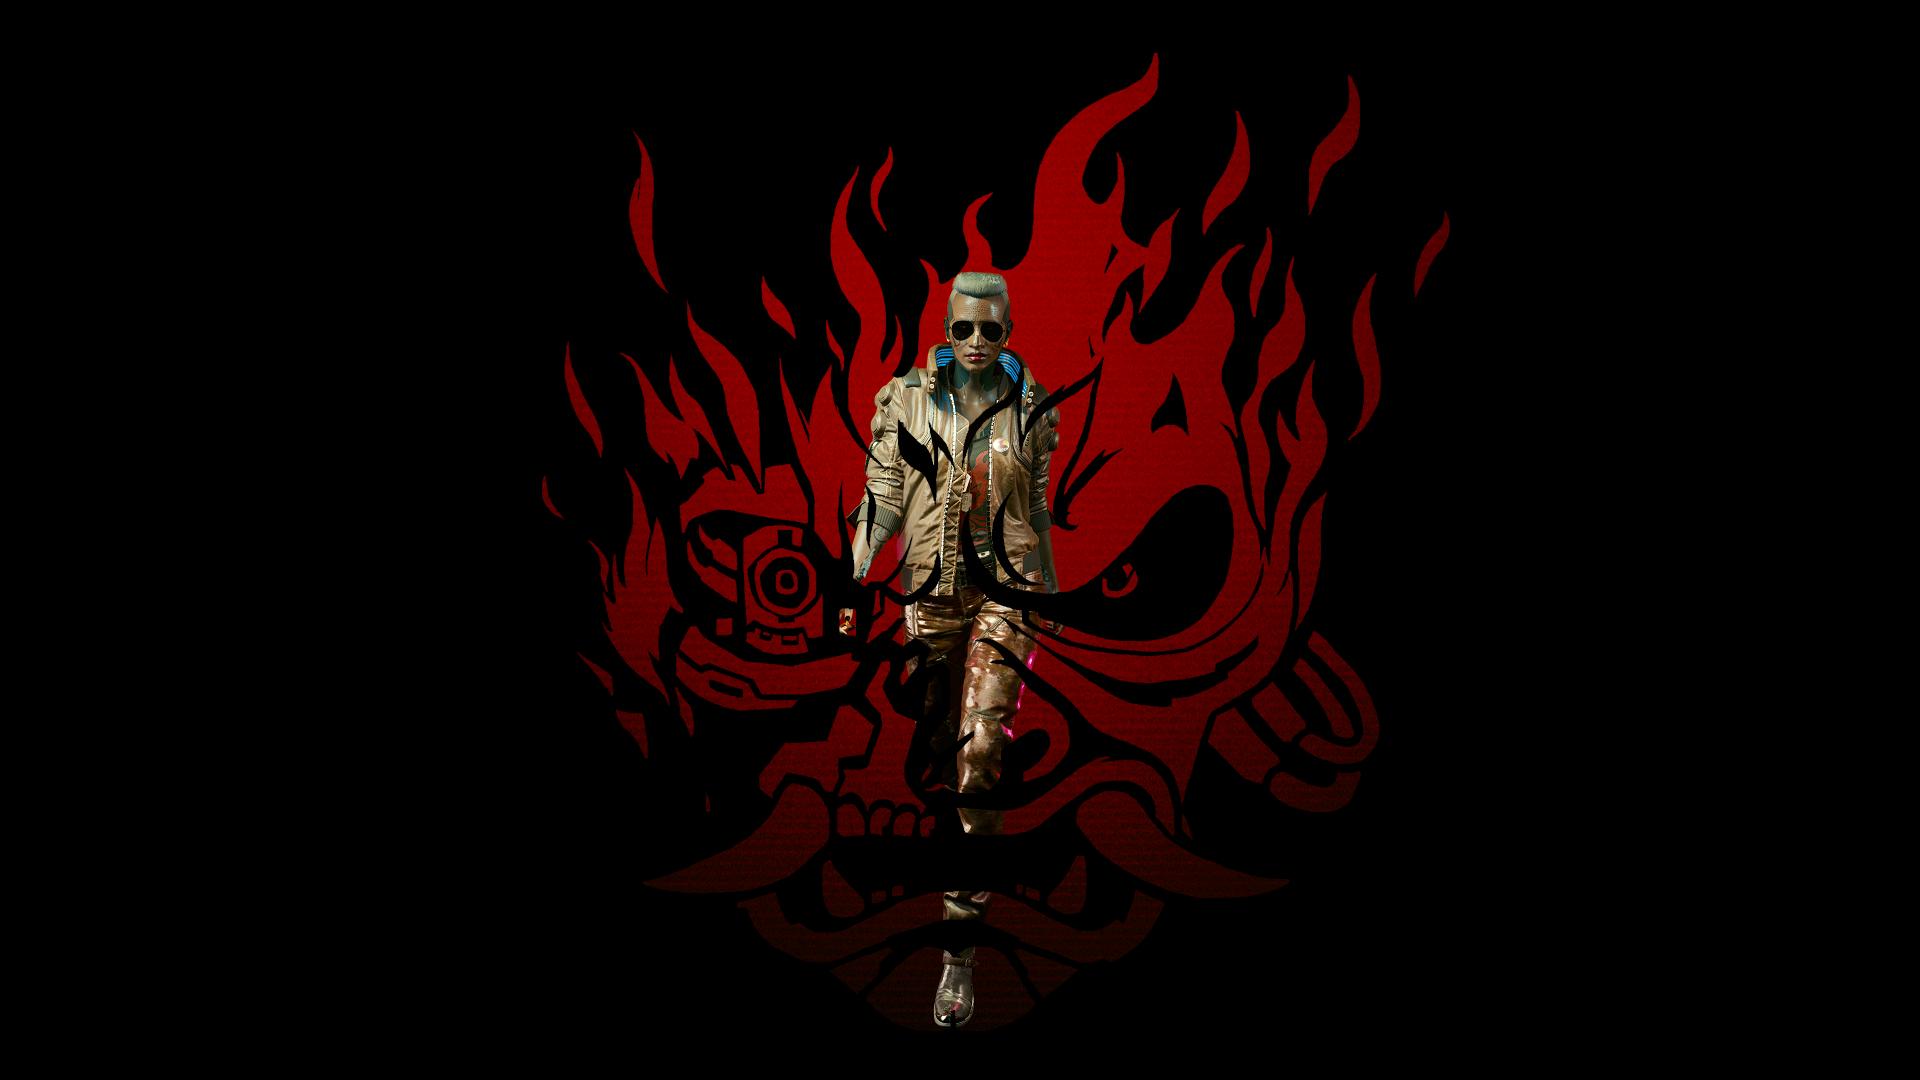 Johnny V Samurai